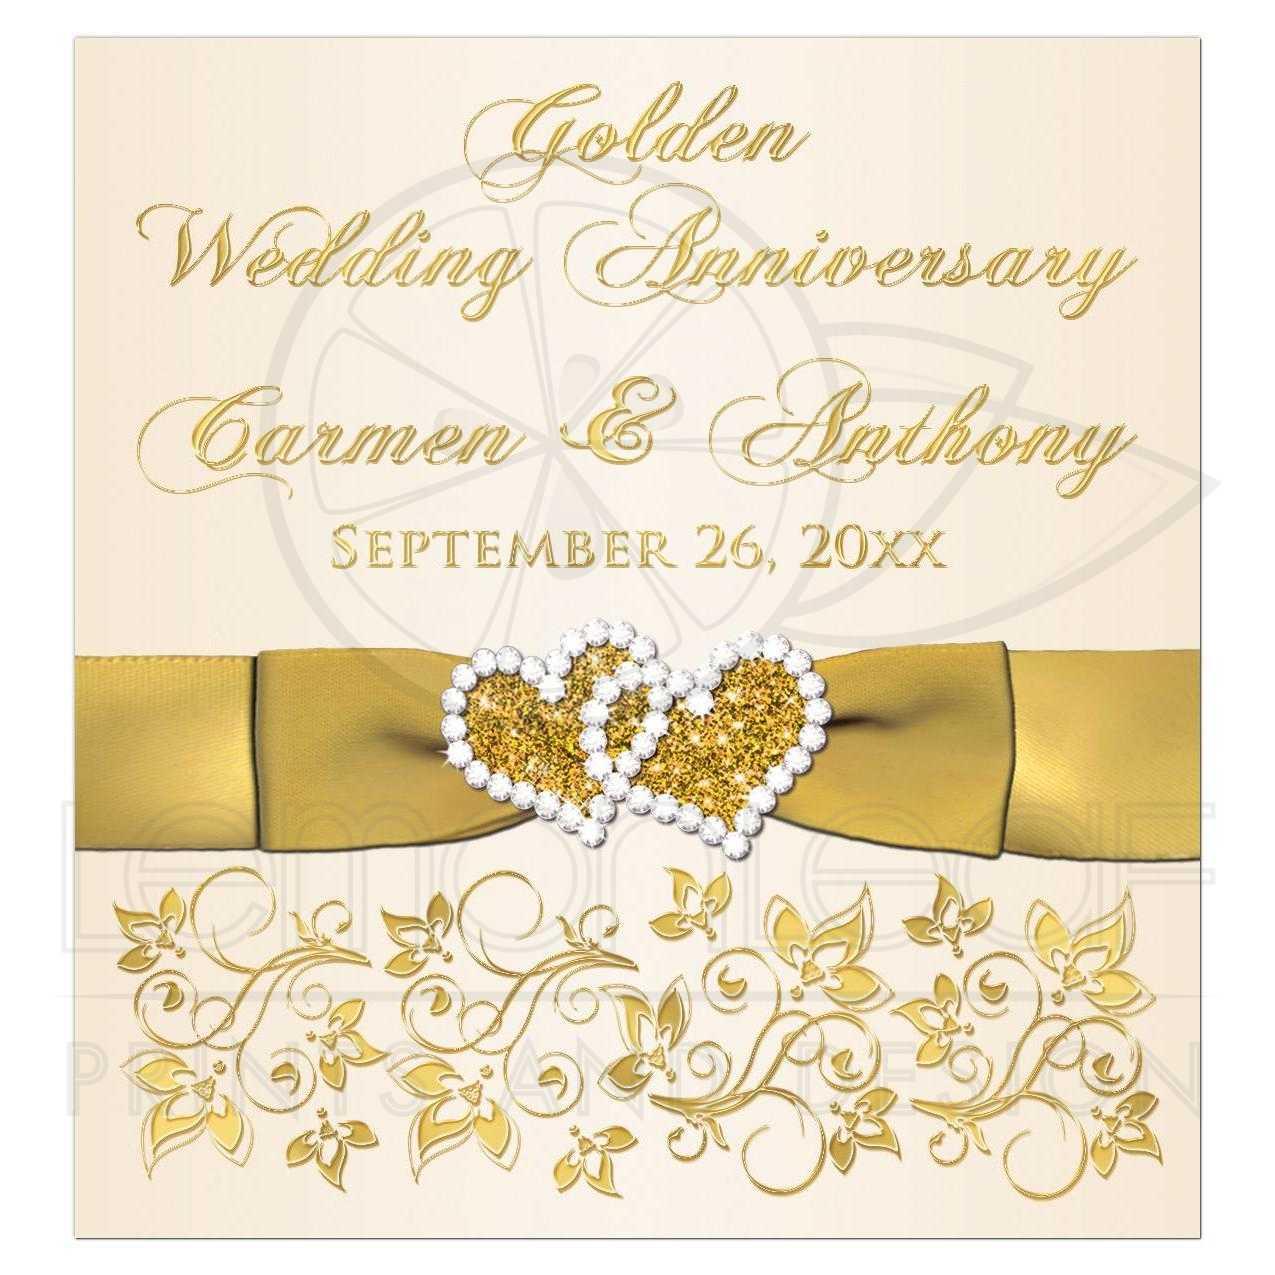 Golden Wedding Anniversary.Golden Wedding Anniversary Wine Or Beverage Bottle Label Ivory Gold Floral Printed Bow Jewels